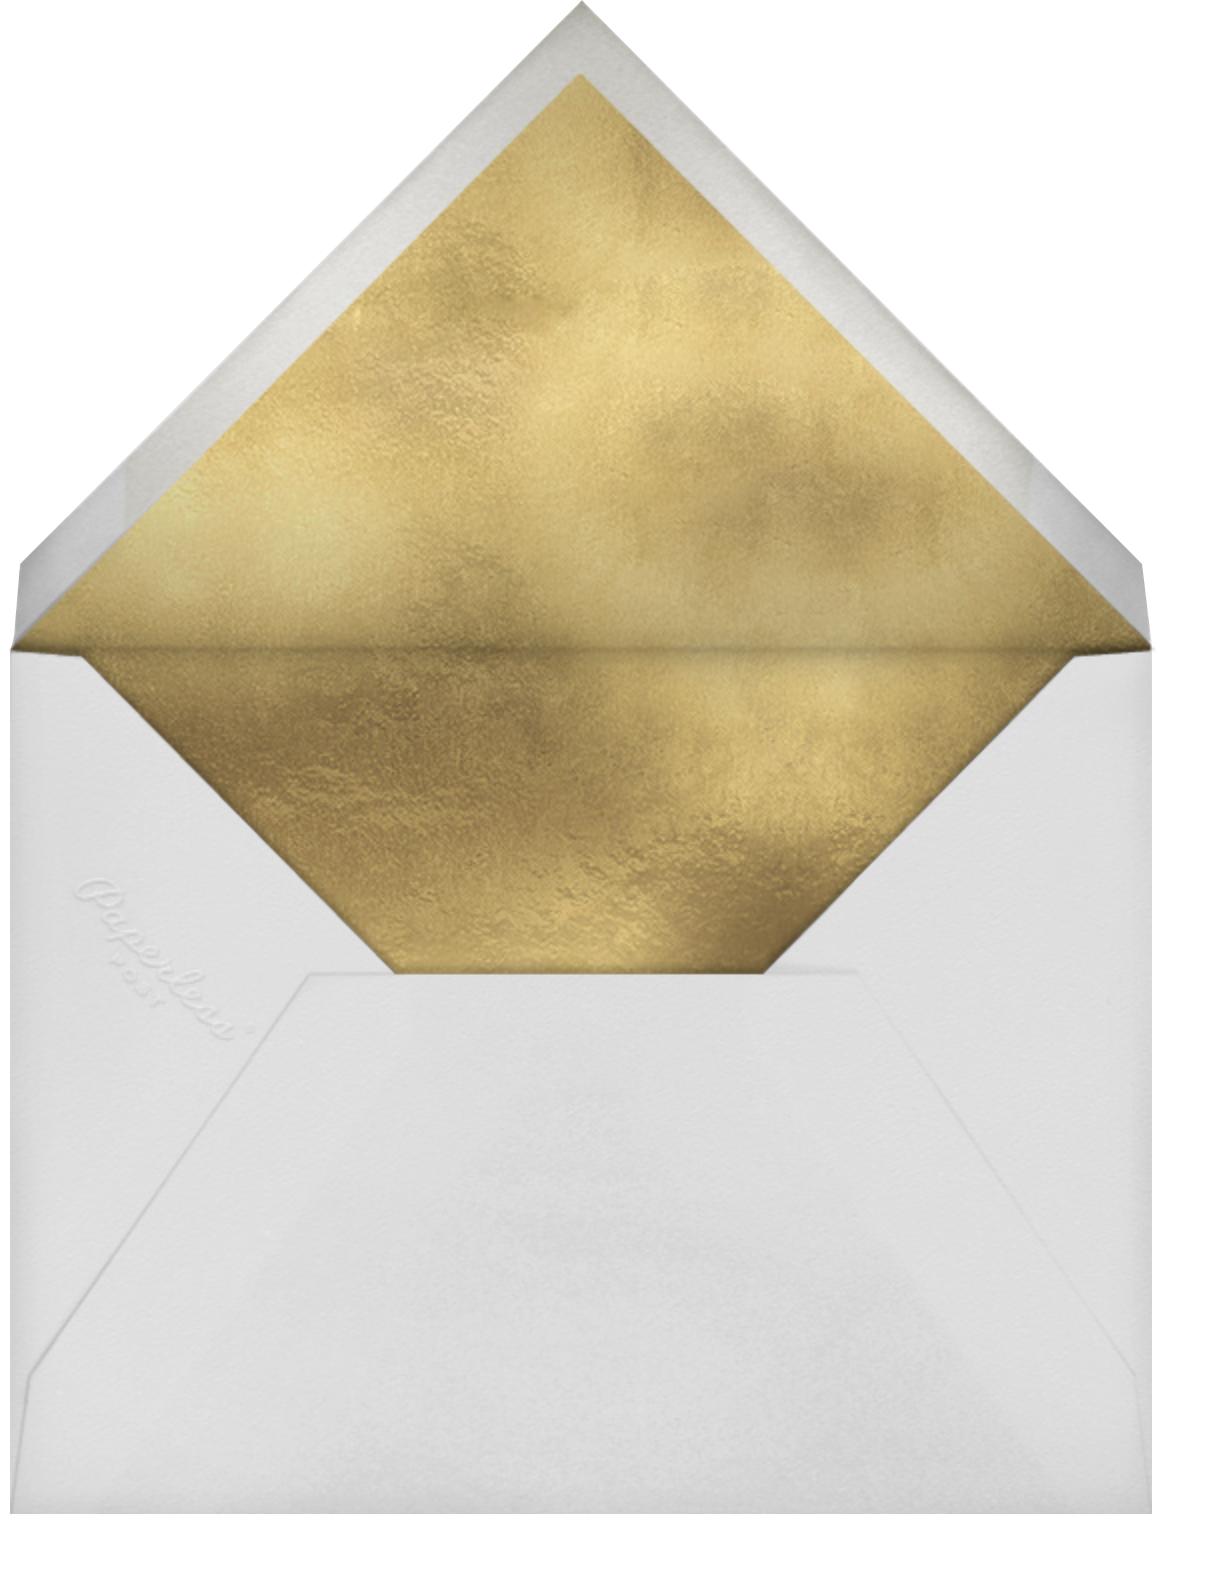 Confetti Caps - Gold - Paperless Post - Graduation - envelope back